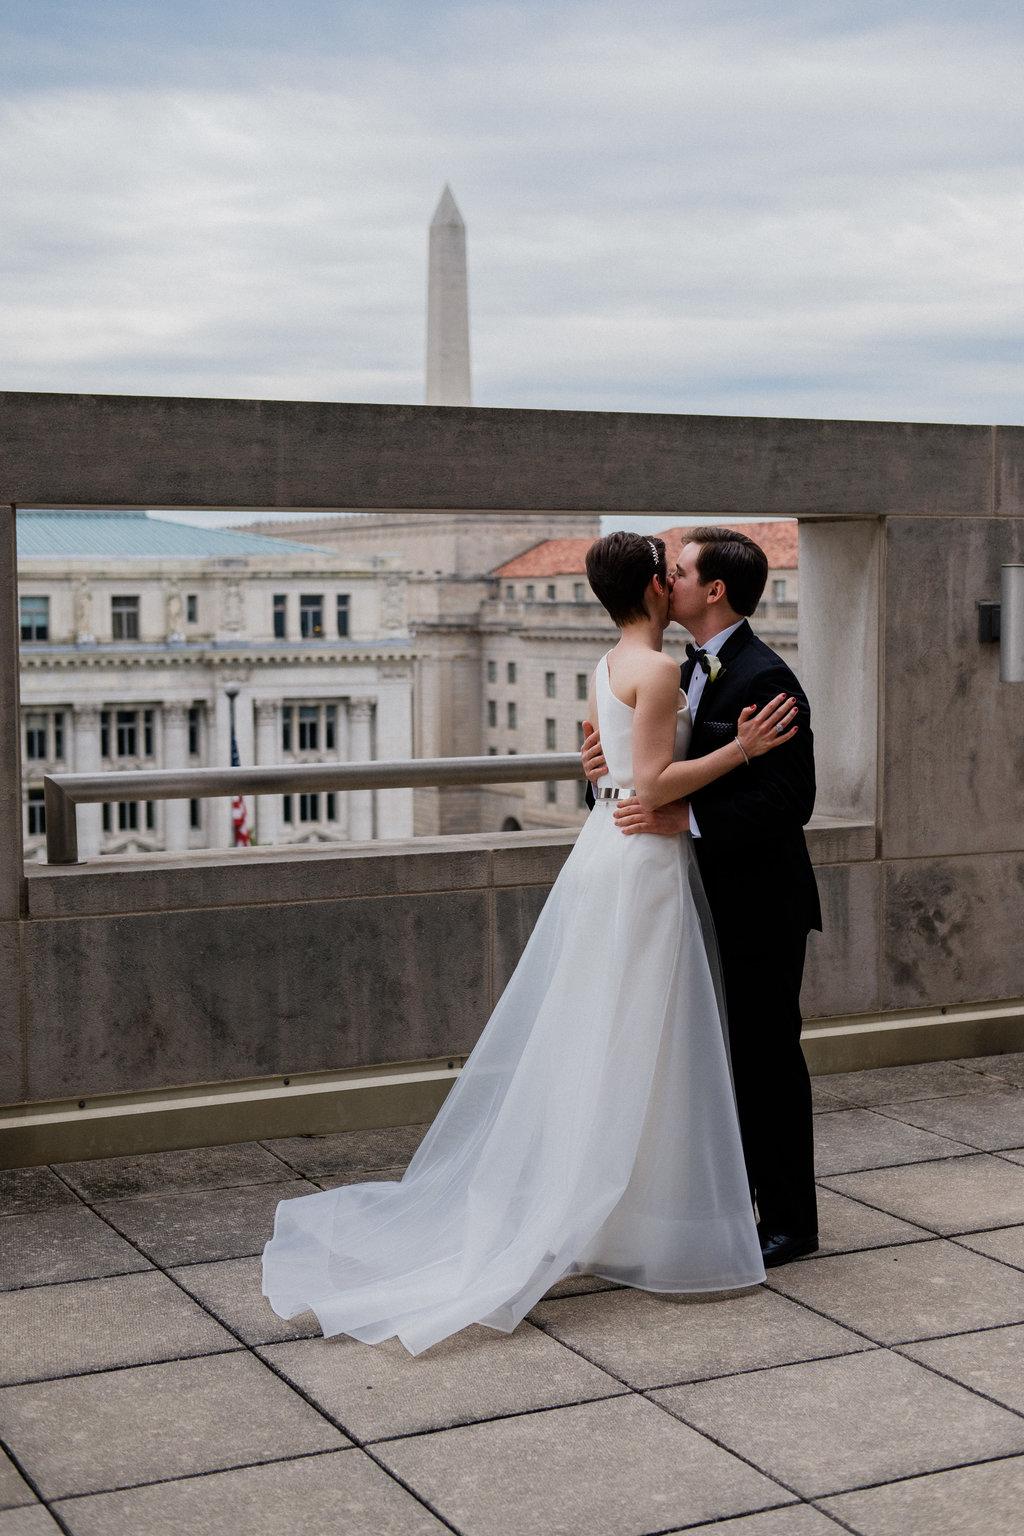 Andrew_Mellon_Washington_DC_Wedding_038.jpg